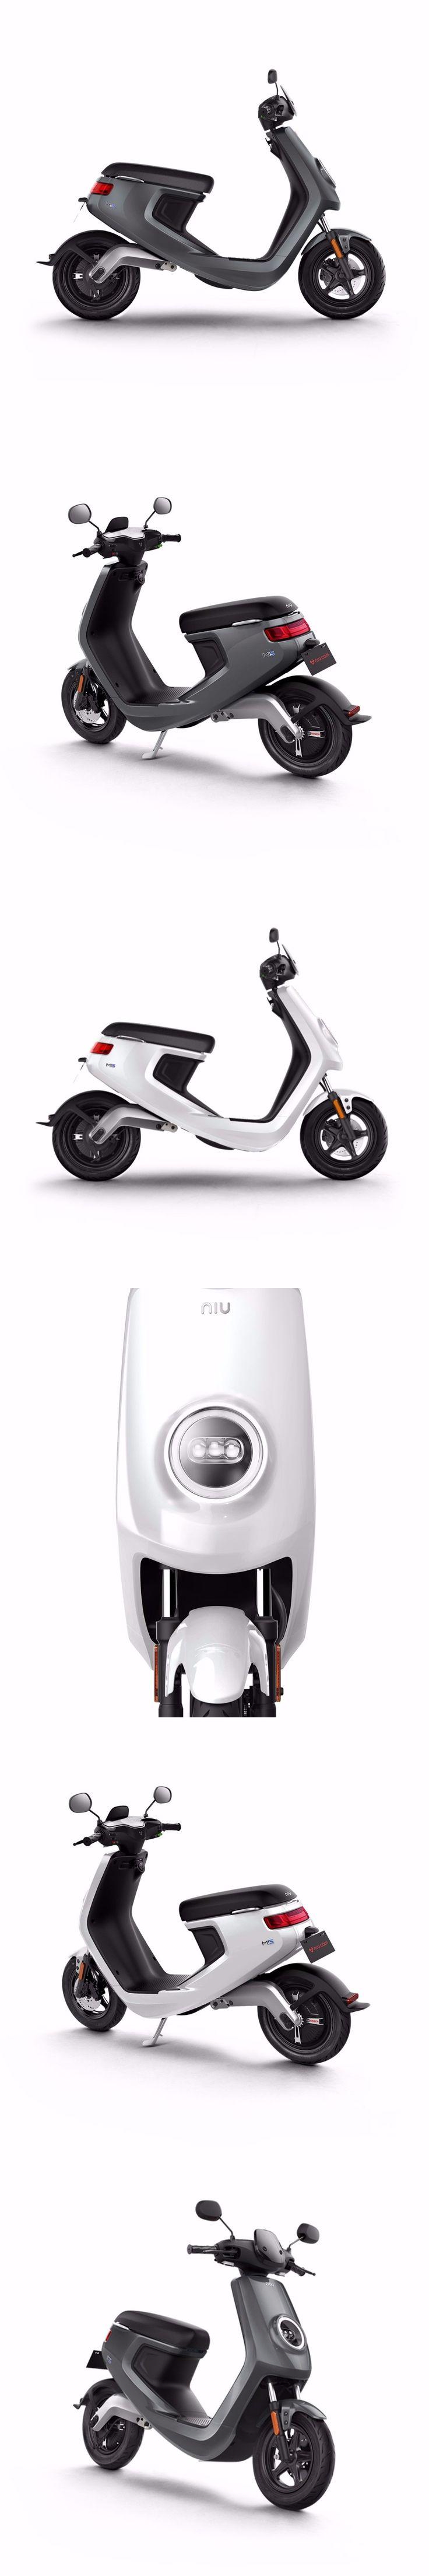 XIAONIU M1 PRO electric bike 1200watts motor 48v36ah llithium battery rang 120km Strong power electric scooters 12inch wheel